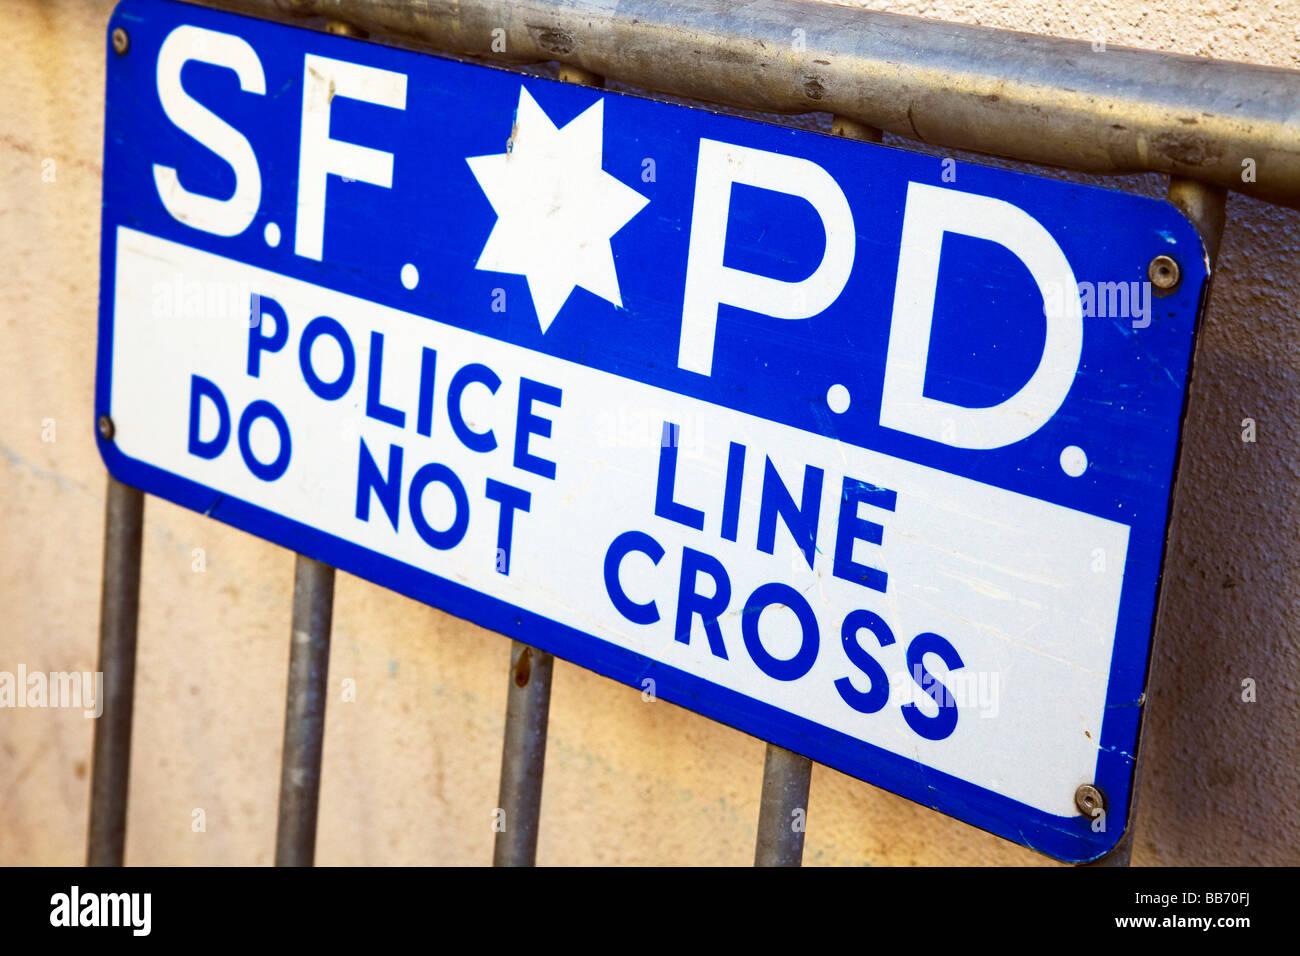 SFPD police line sign, San Francisco Police Dept - Stock Image